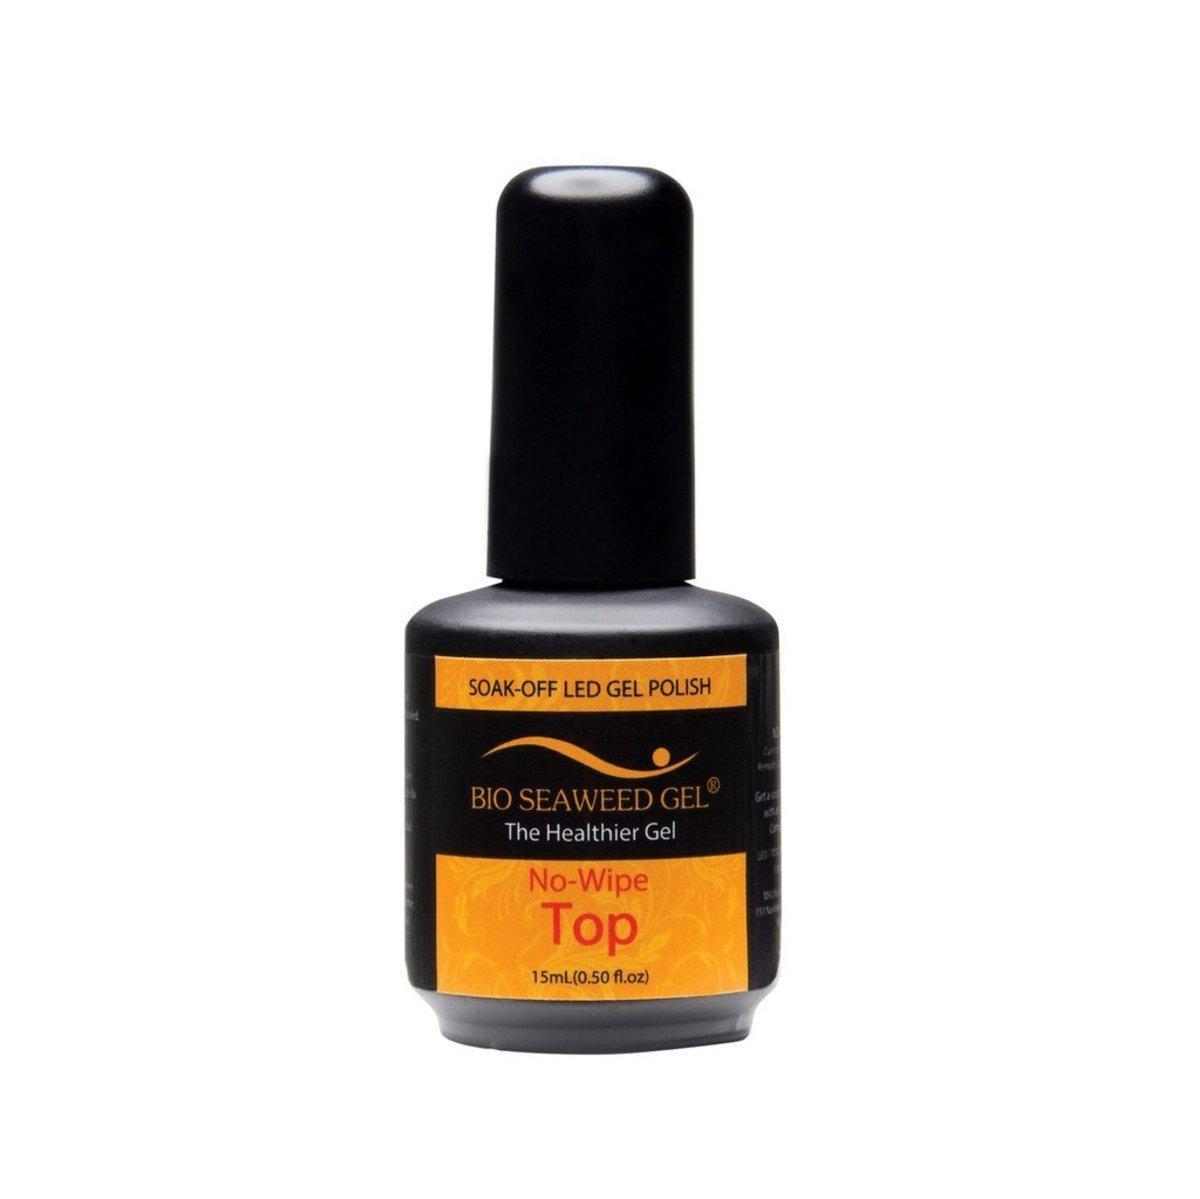 No-Wipe Top Gel Polish